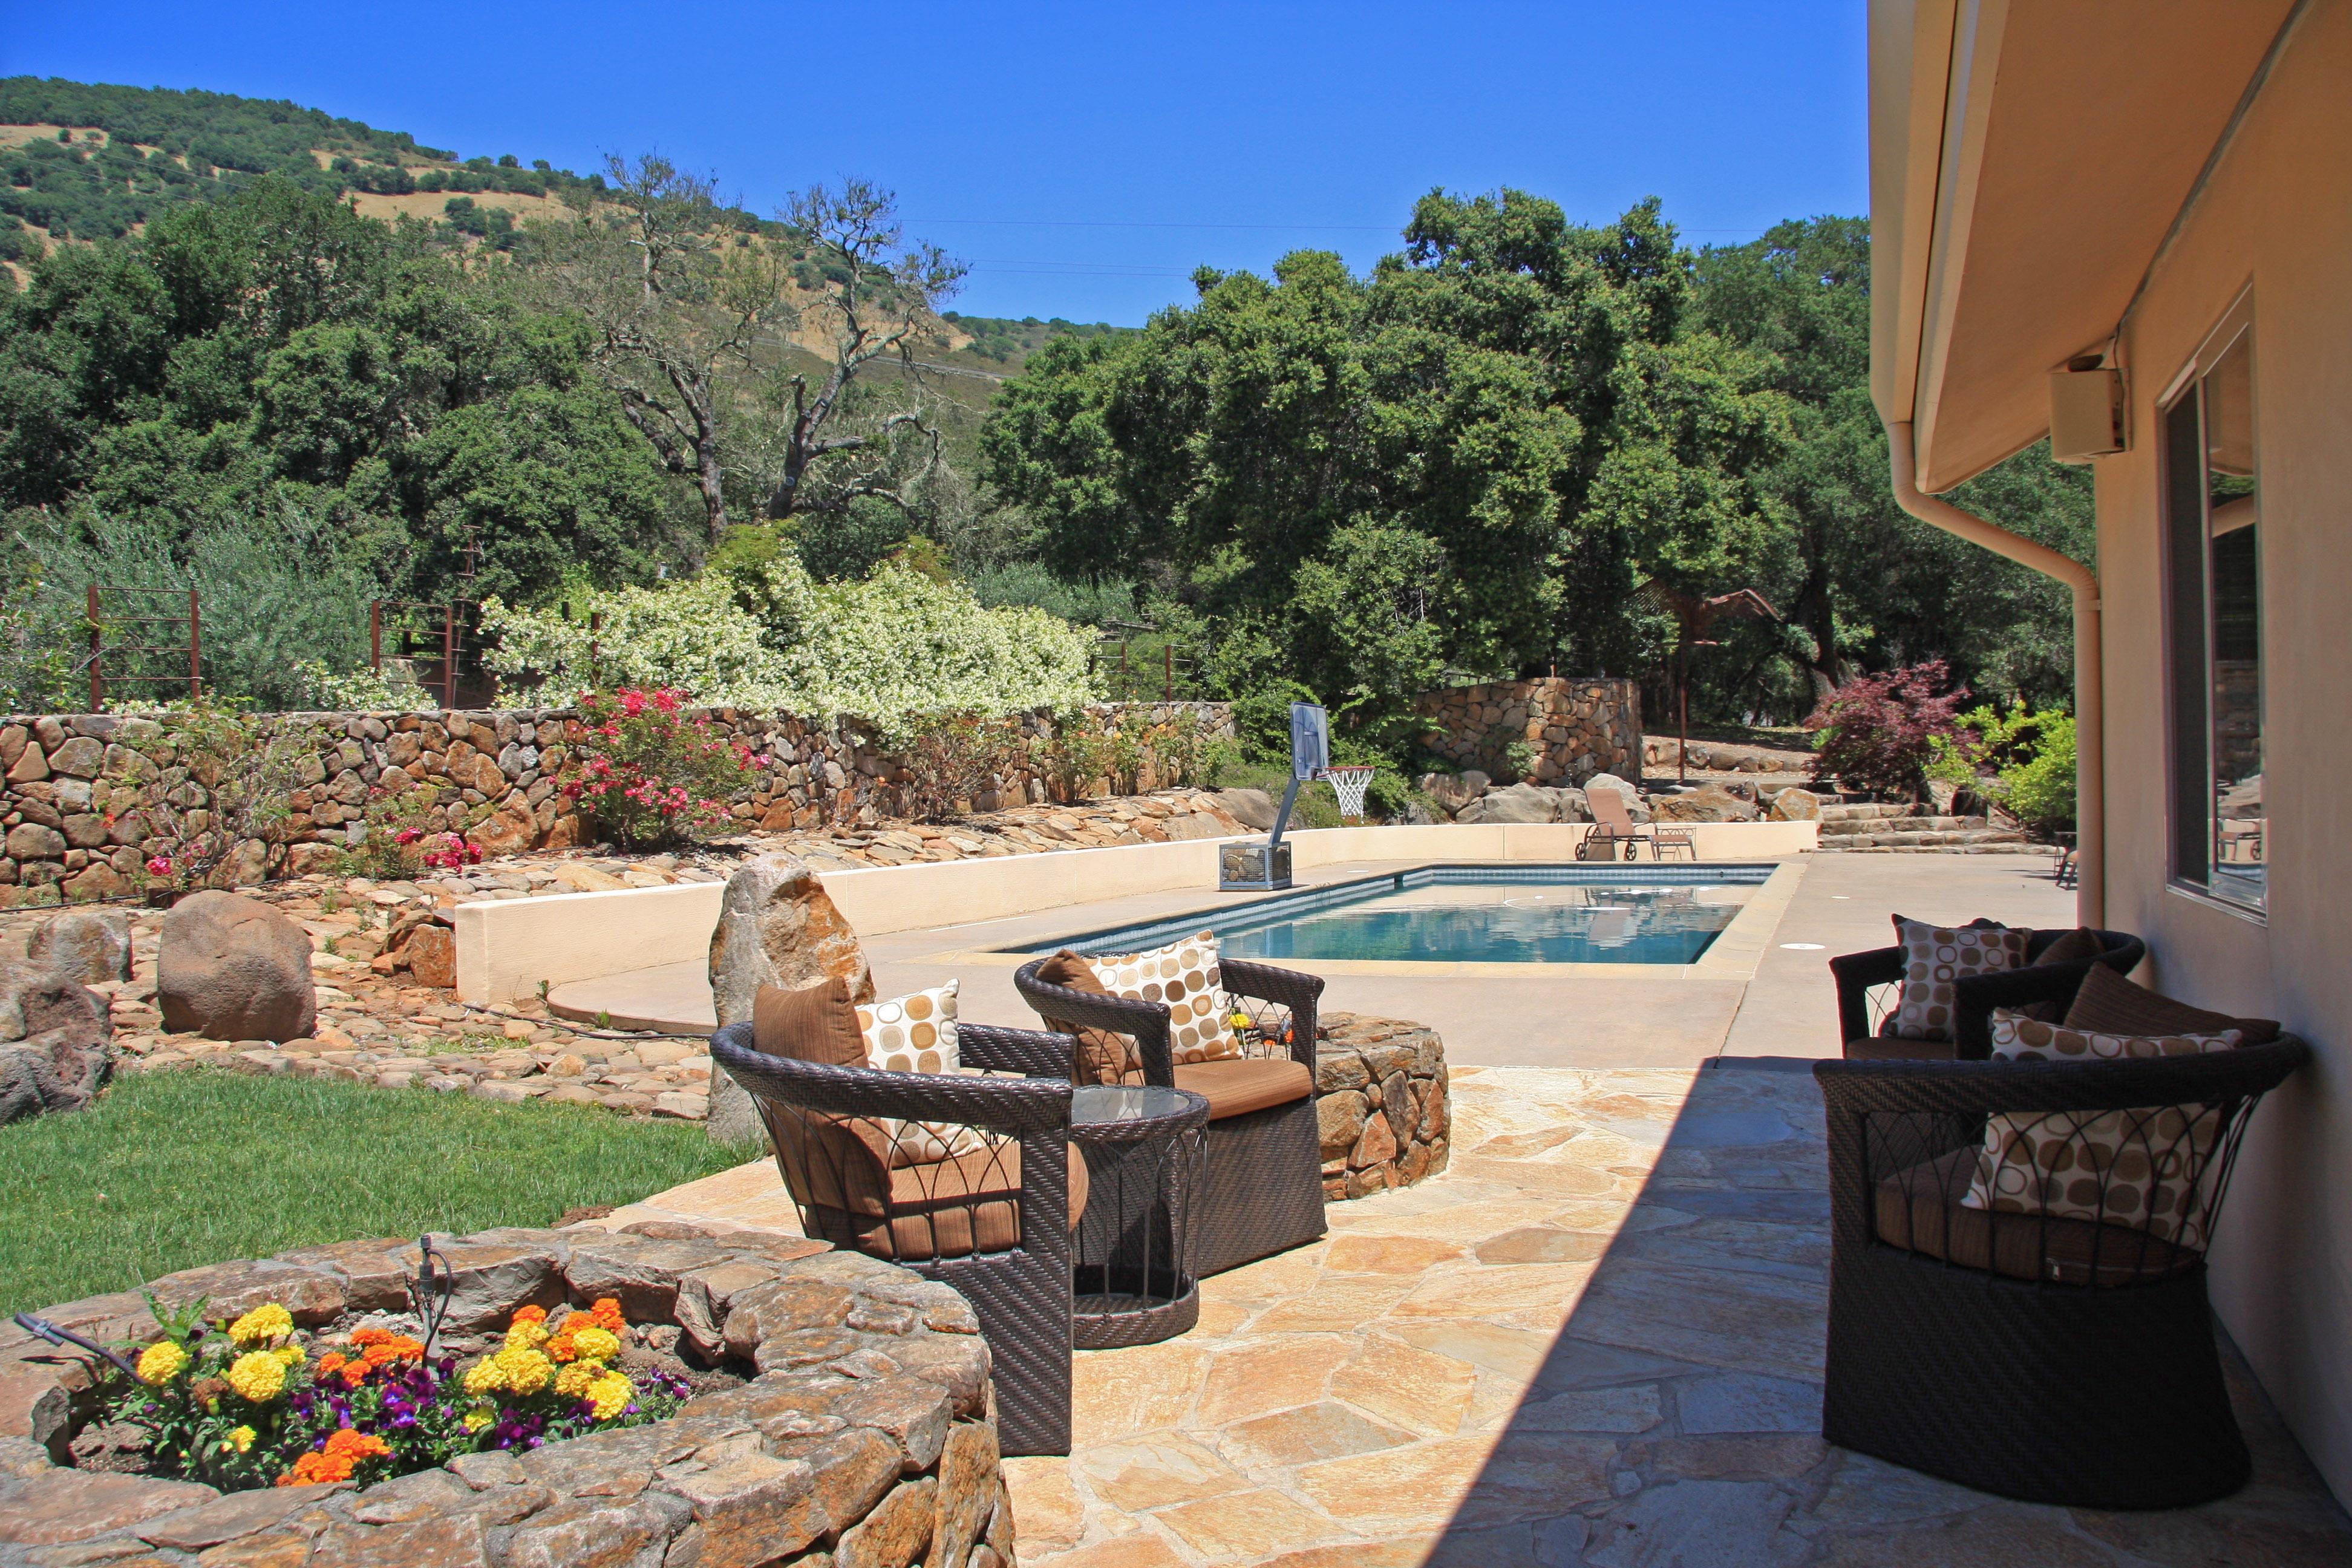 Casa Unifamiliar por un Venta en Rare Oakville Opportunity 7766 Silverado Trail Napa, California, 94558 Estados Unidos